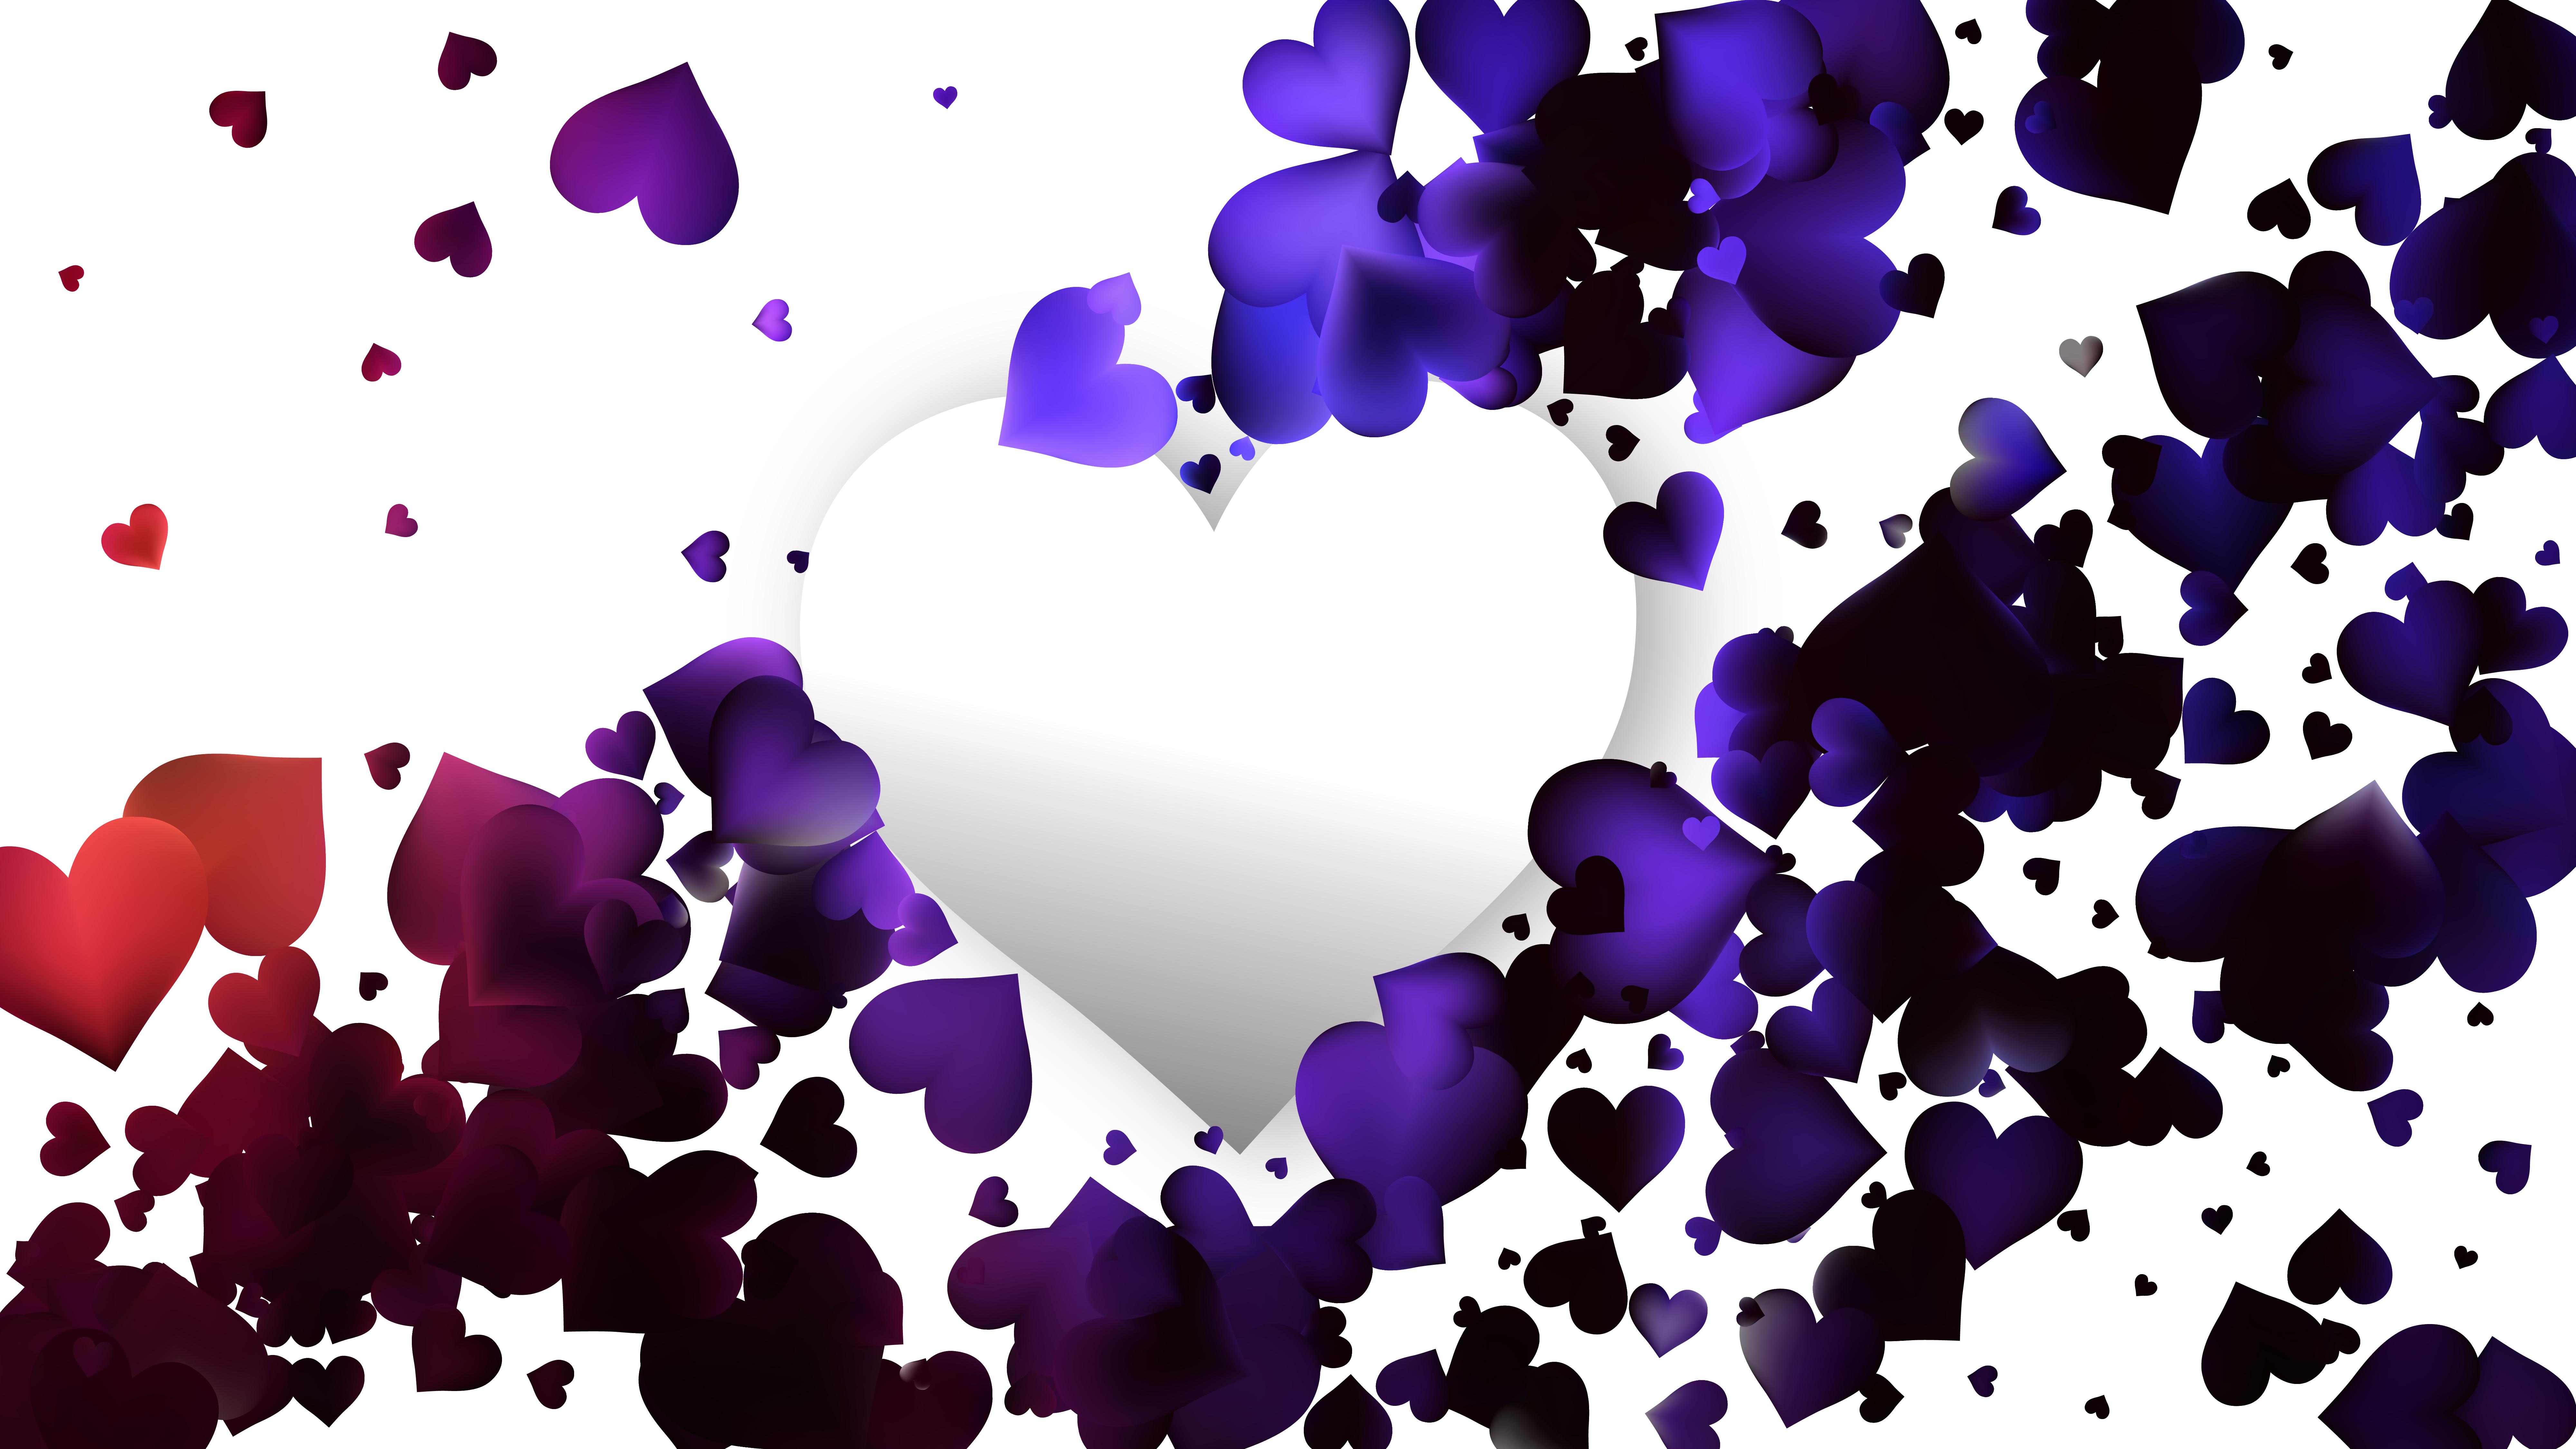 110083 purple and black heart